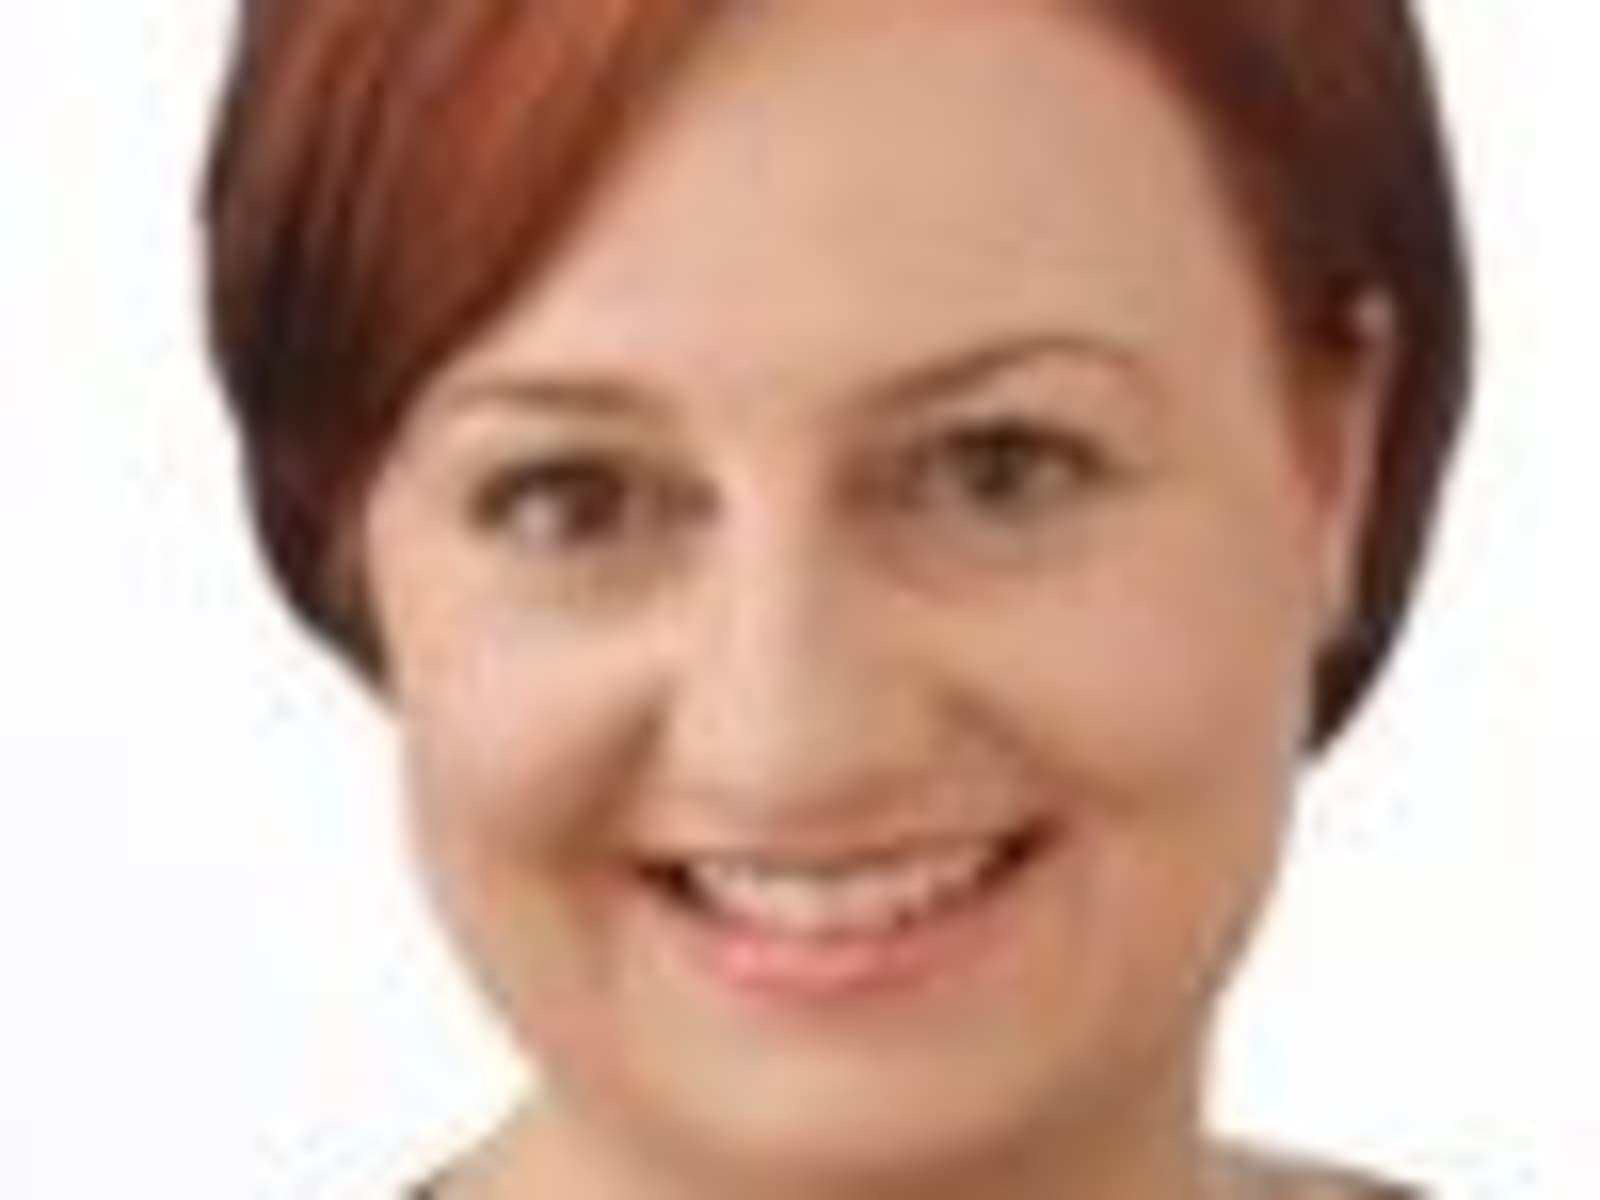 Linda from Canberra, Australian Capital Territory, Australia